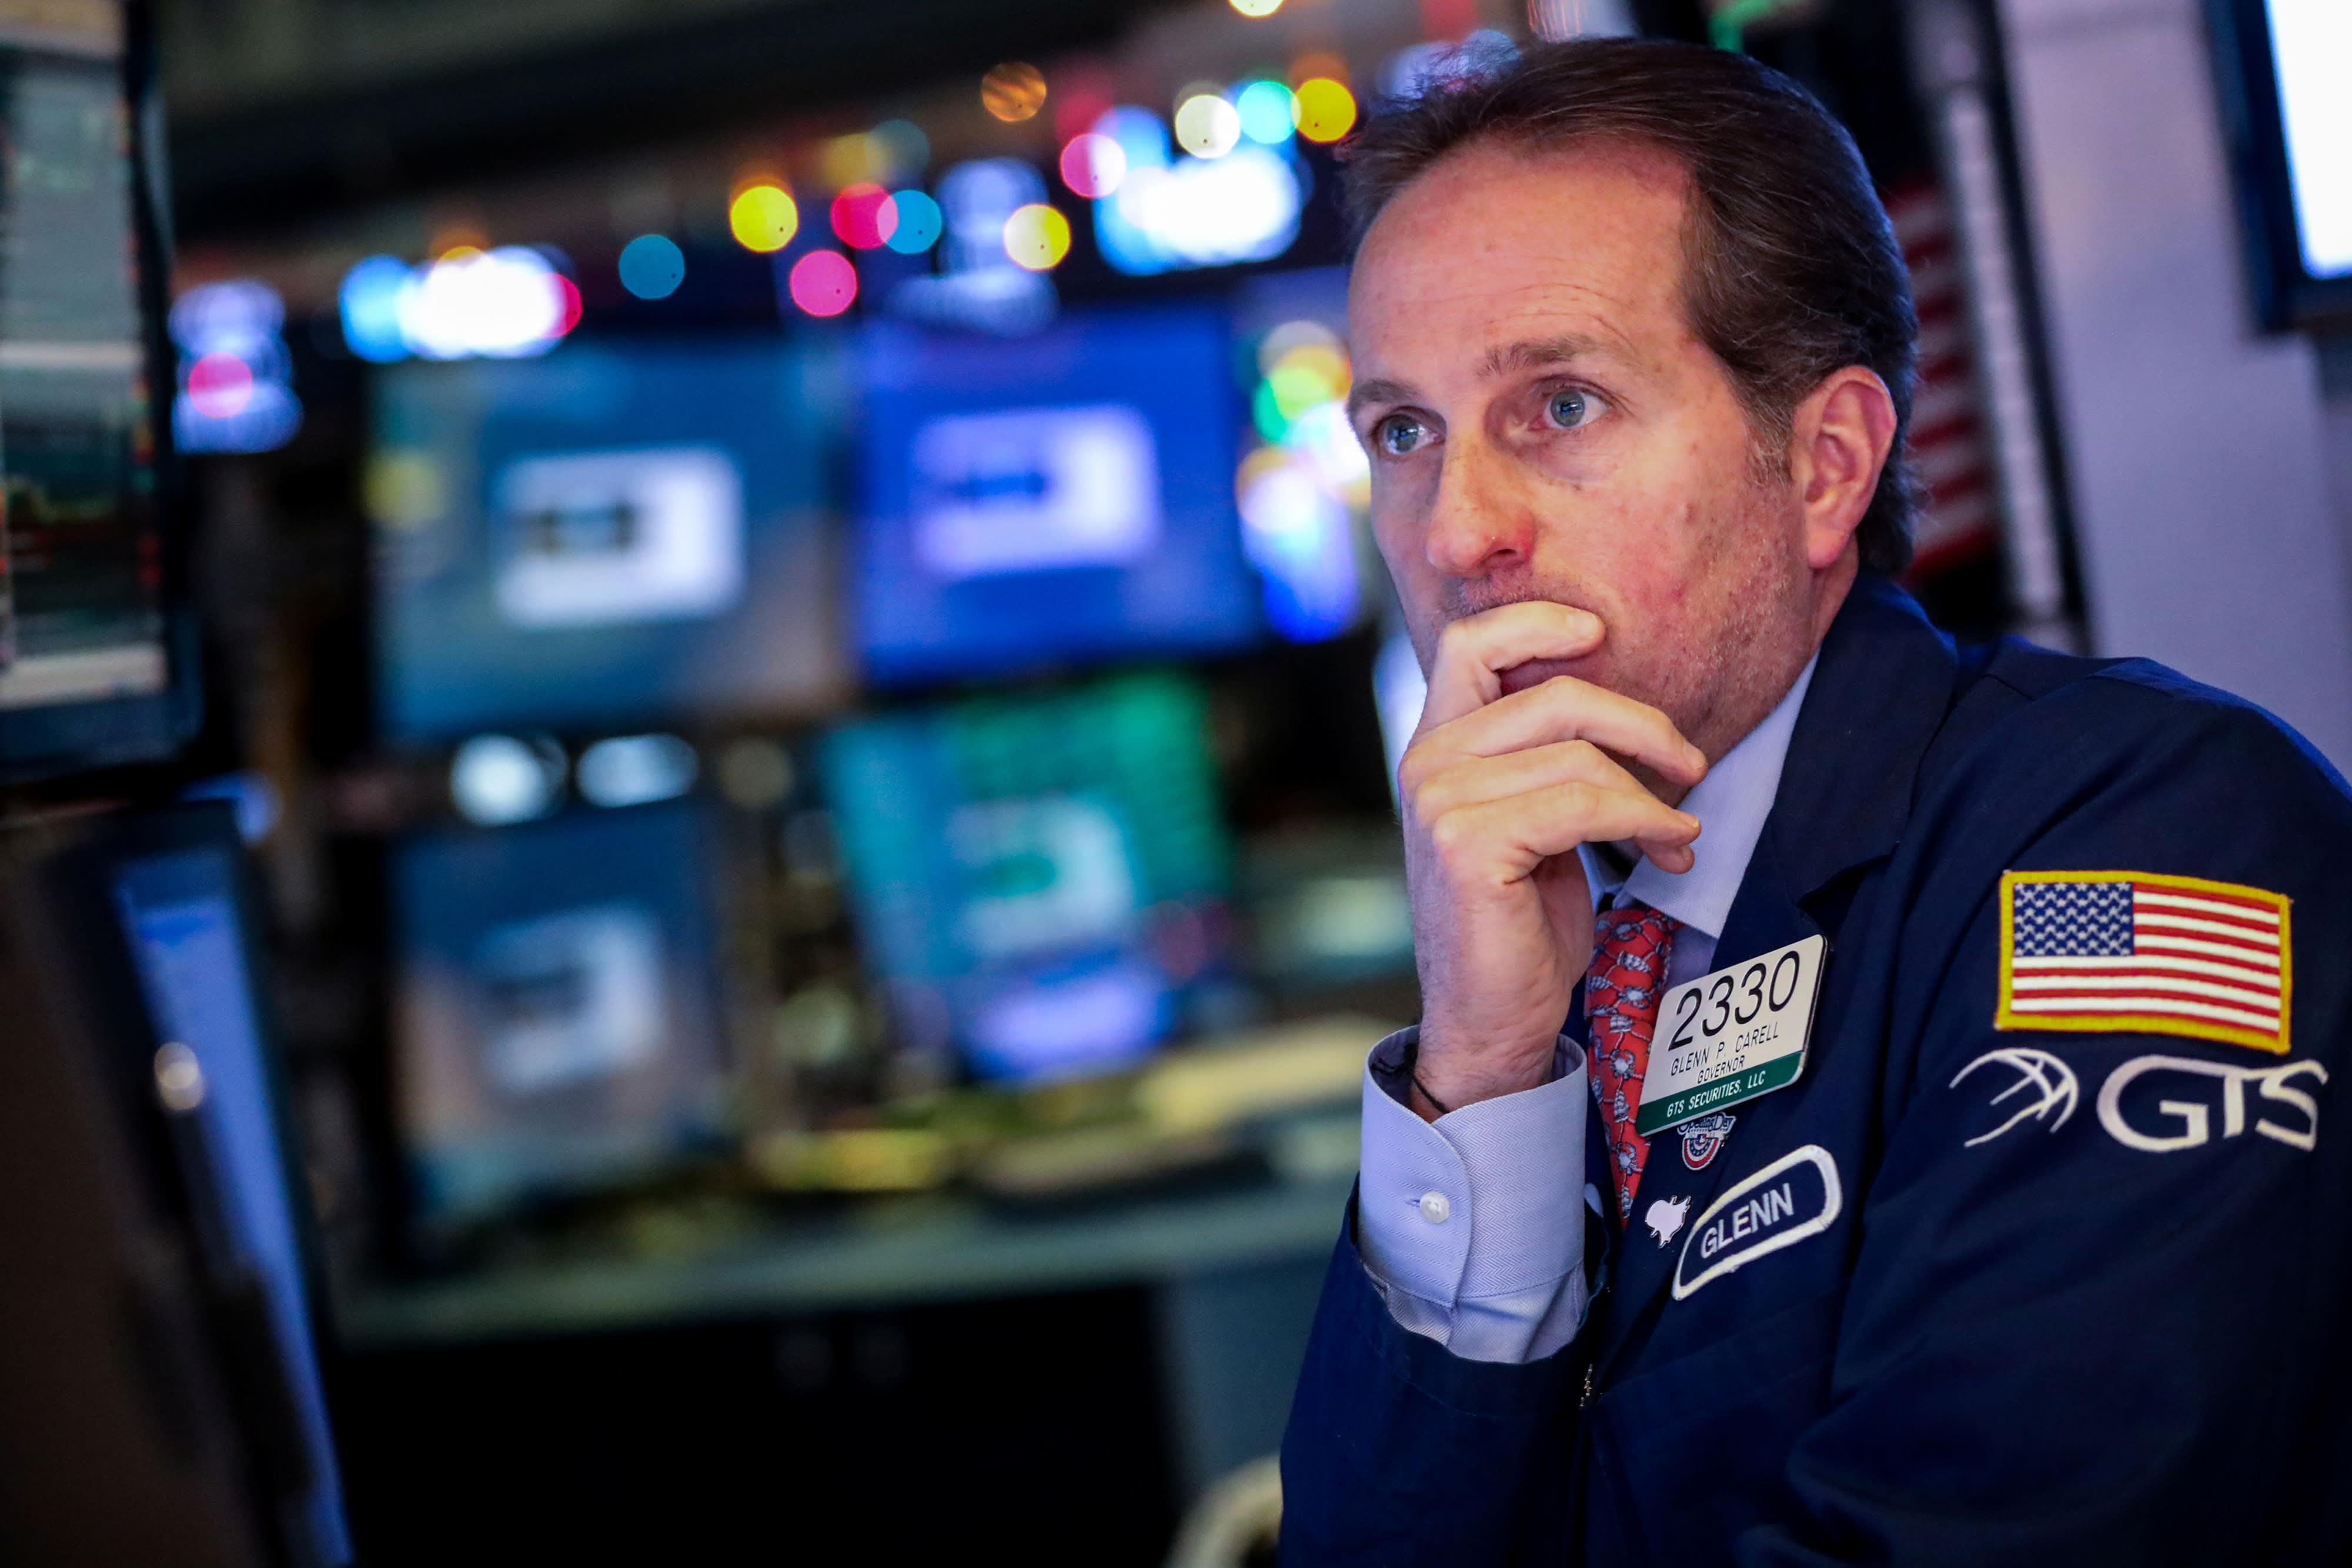 Treasuries, yen, gold make 3 best safe havens in crisis, HSBC says